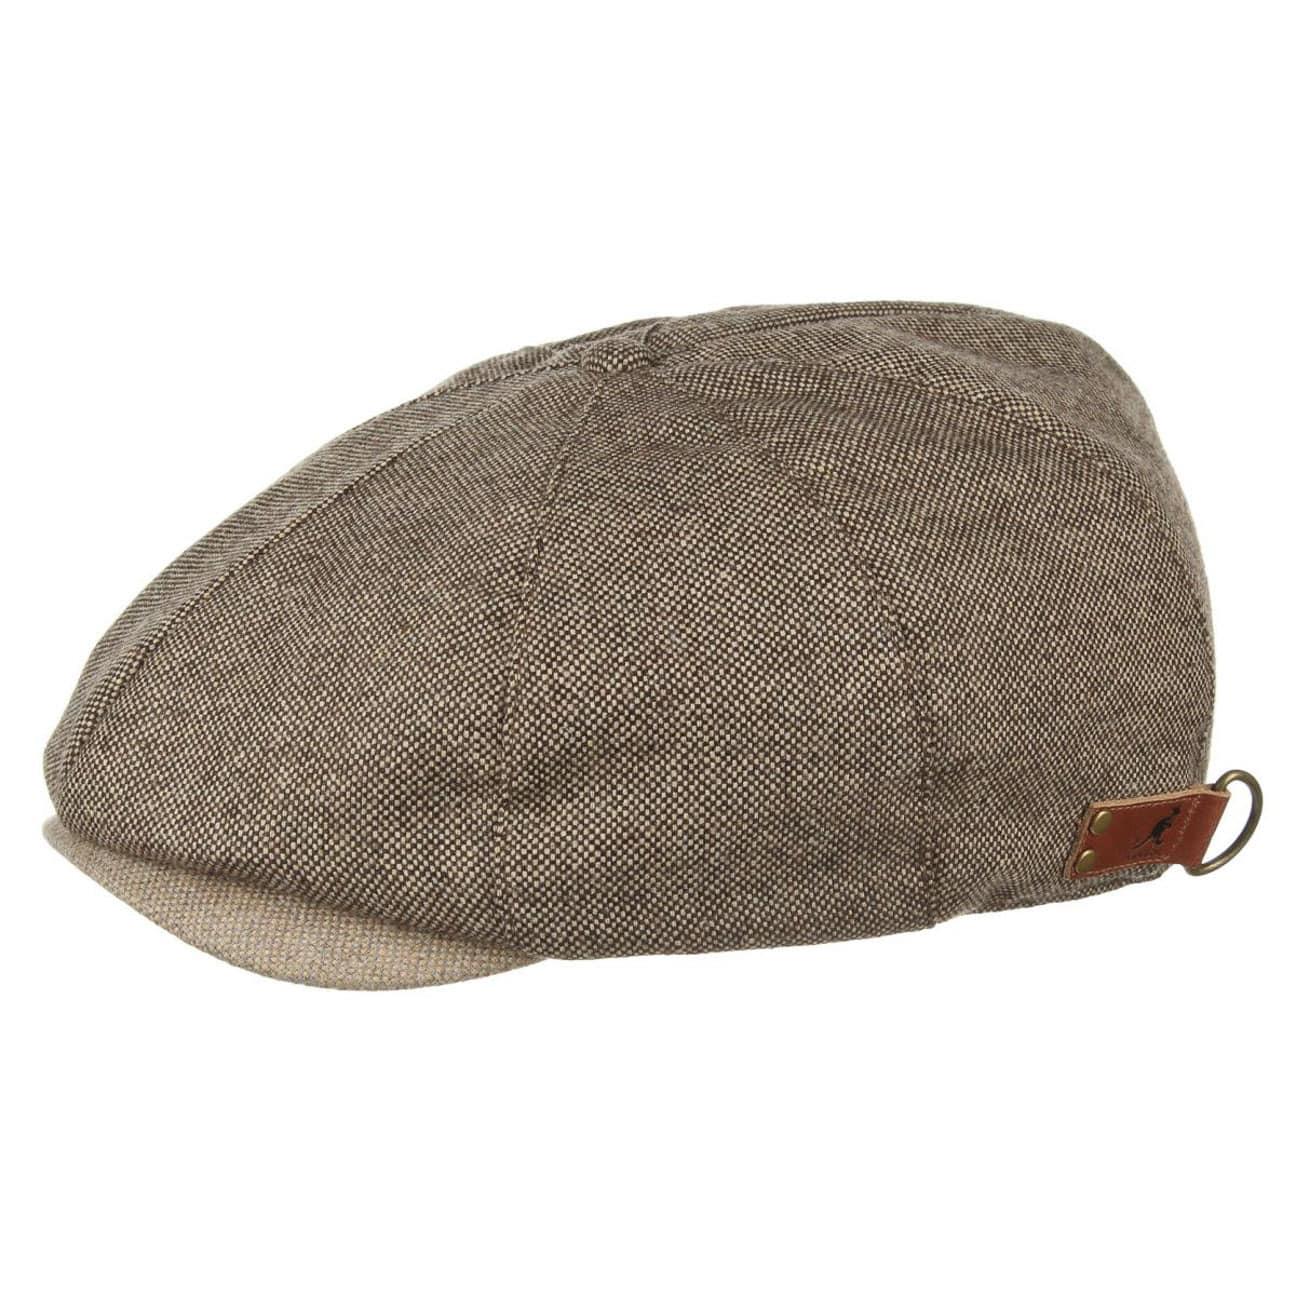 Donegal Ripley Tweed Flat Cap by Kangol - brown 1 ... 6e3df53493f